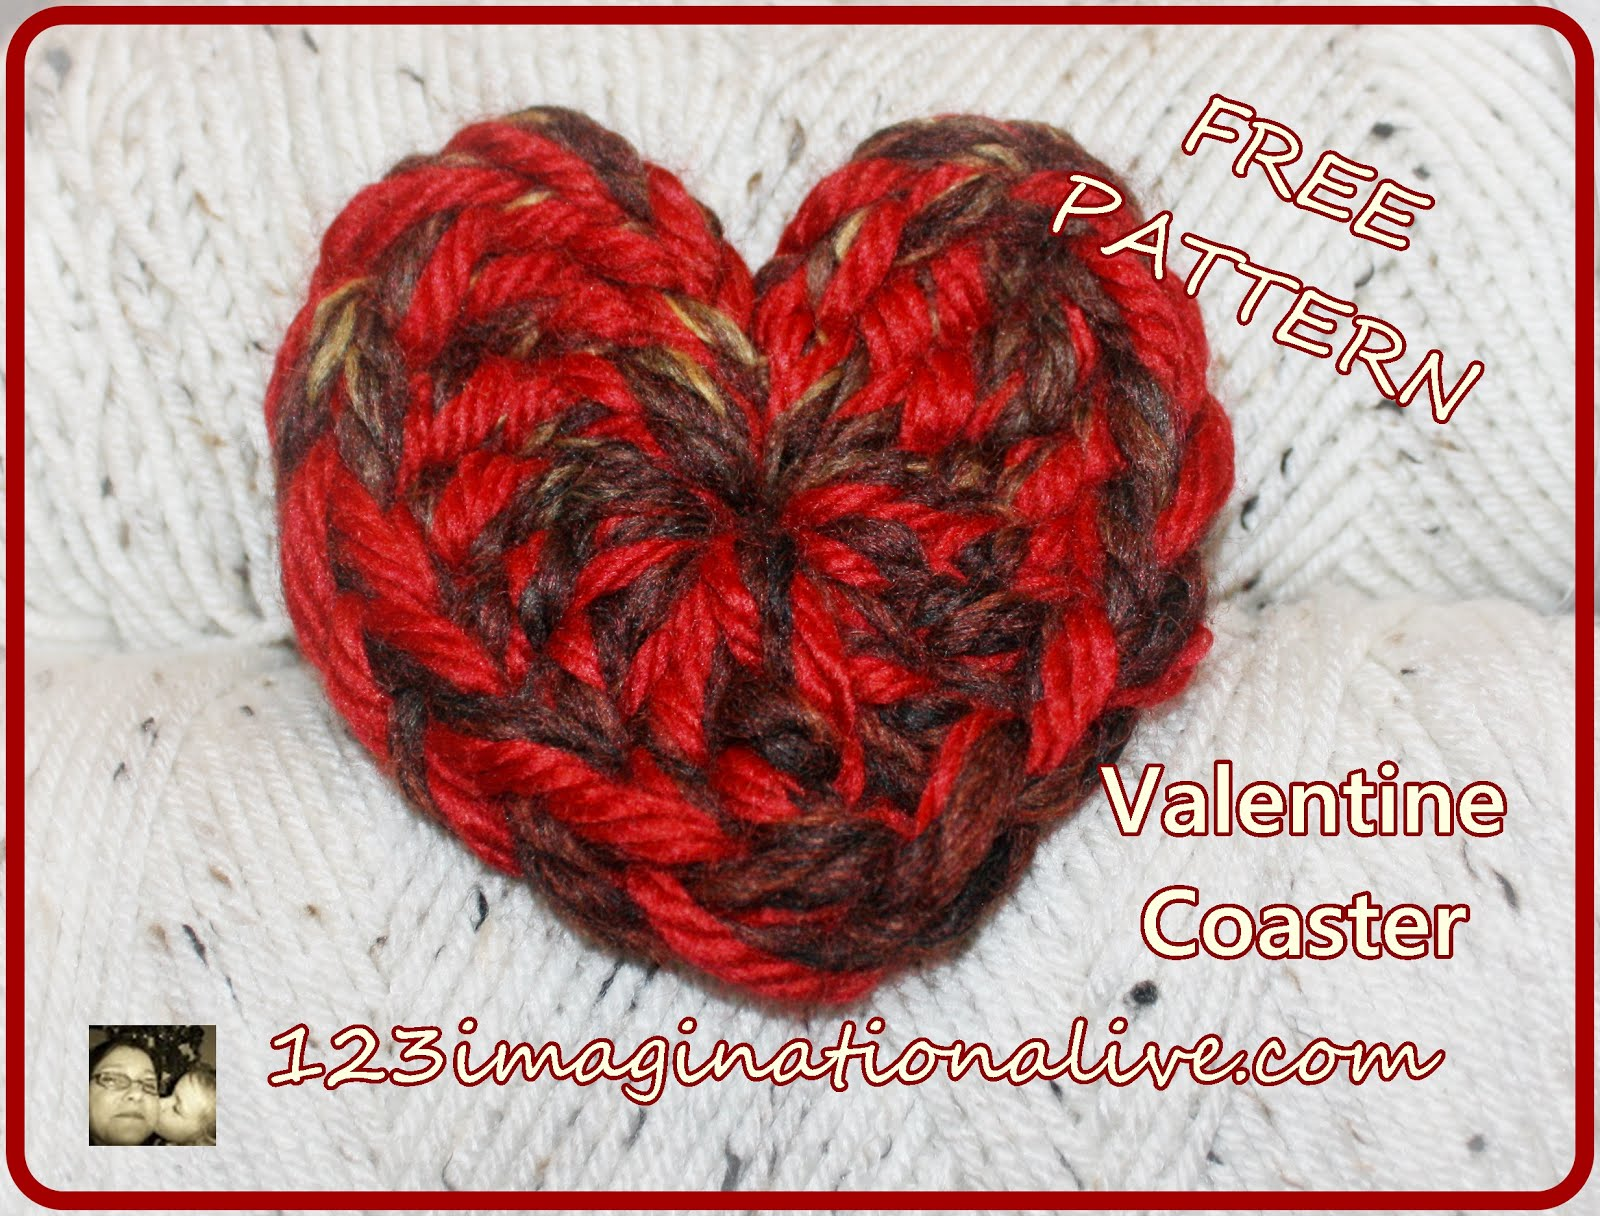 Valentine's Day Coaster